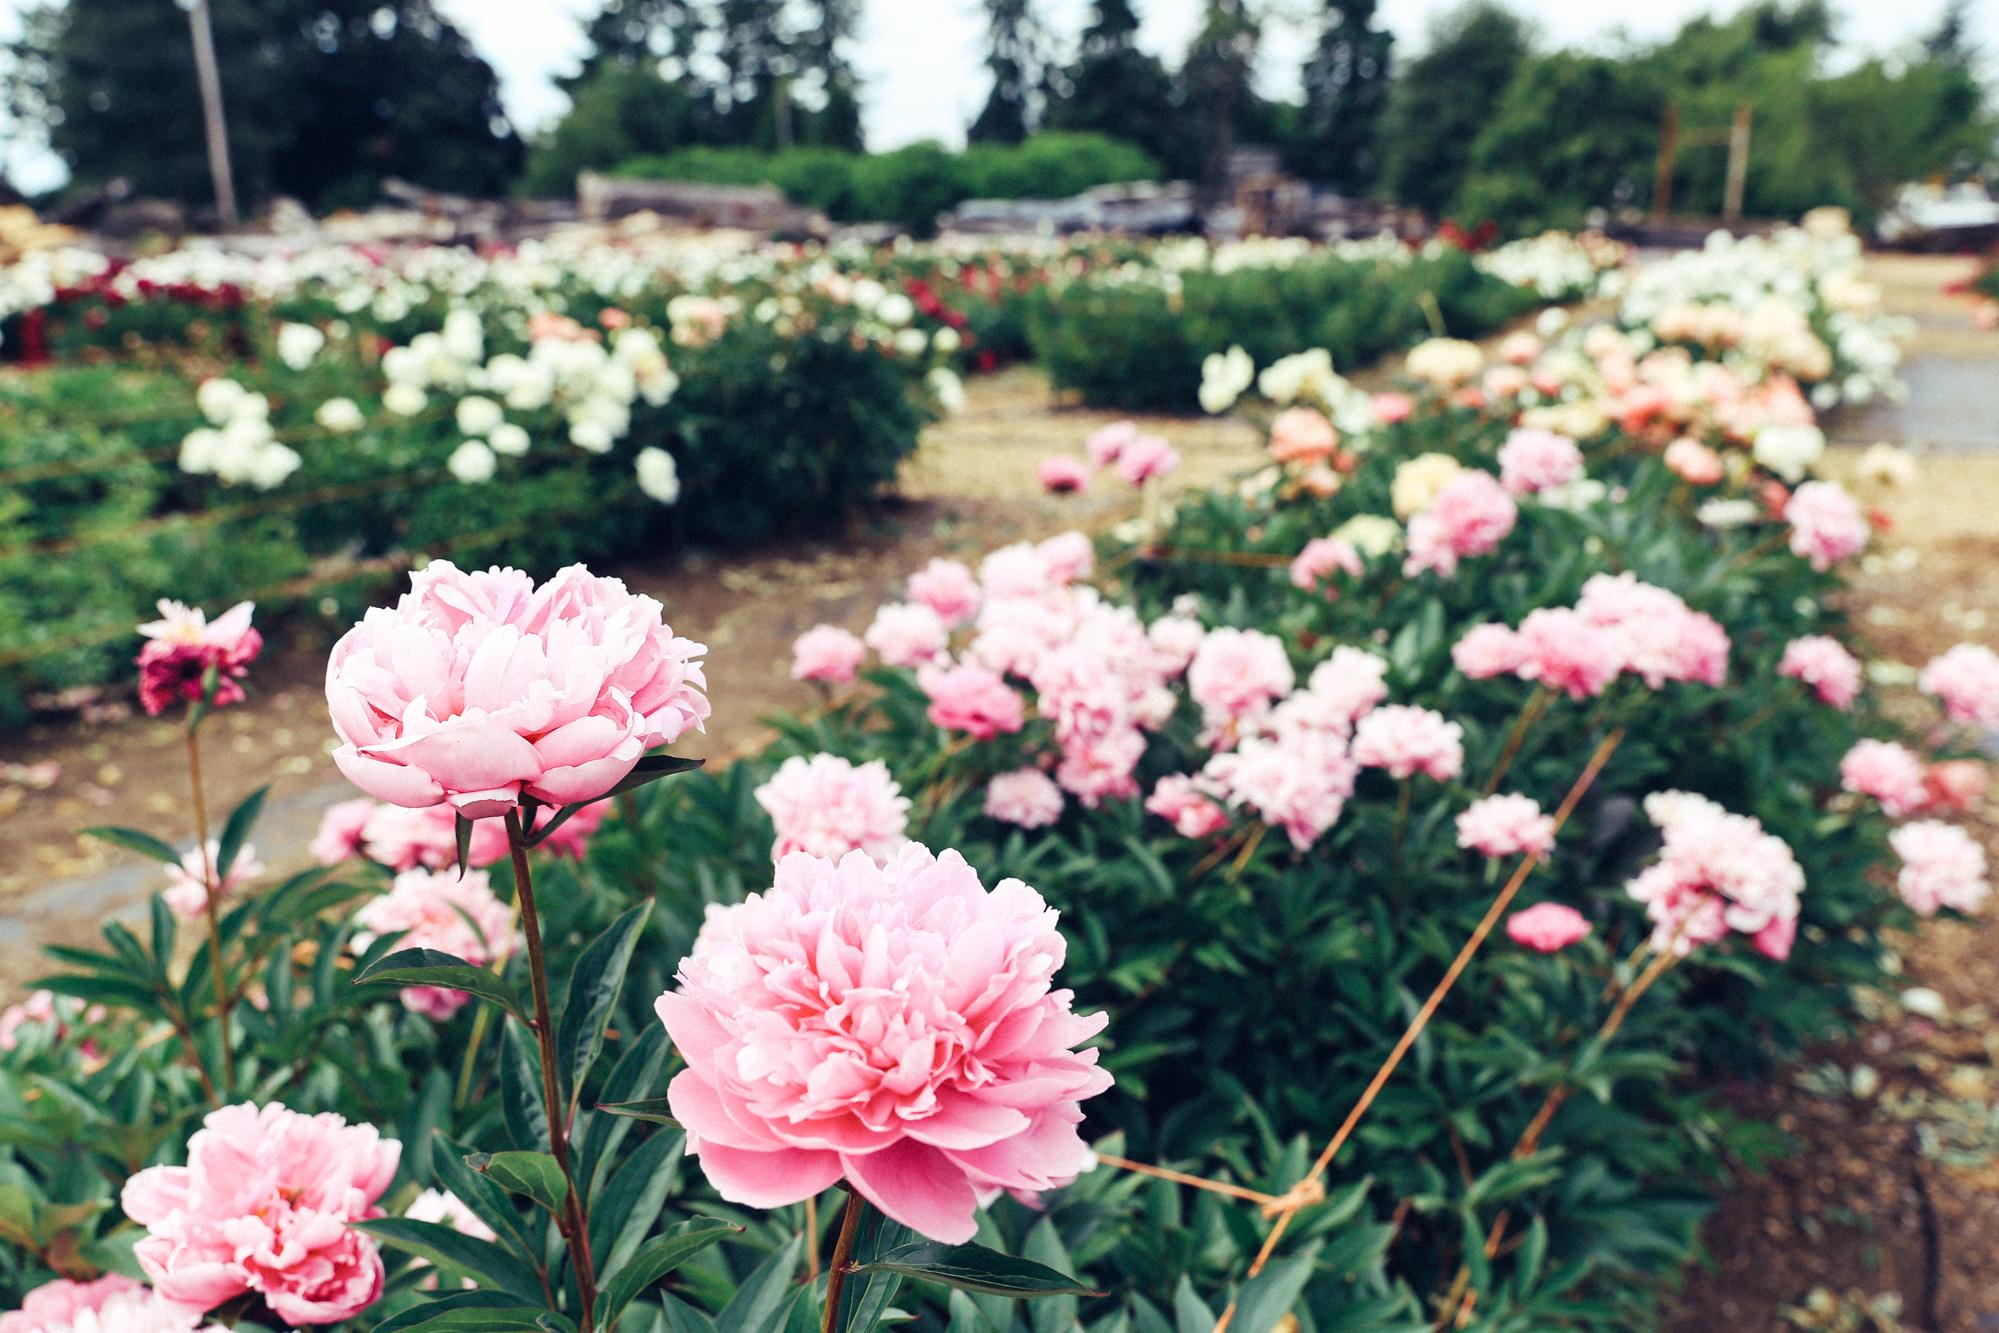 PNW Peony Farm - Oh Flora Travels-4.jpg